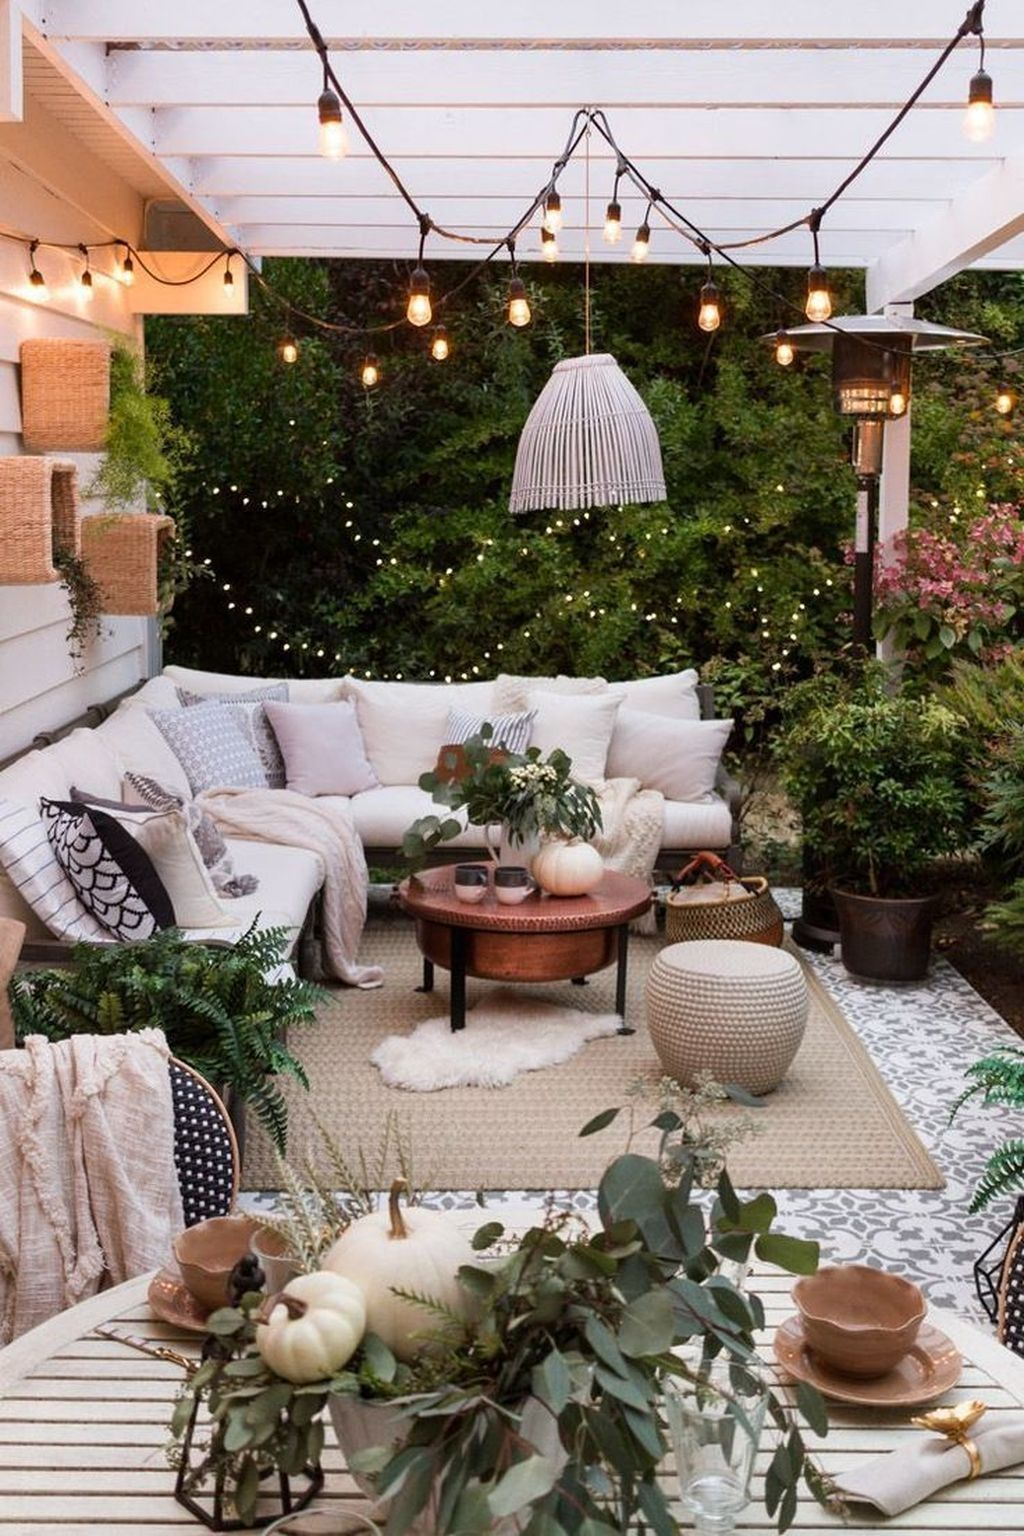 56 Wonderful Backyard Decorating Ideas On A Budget Outdoor Patio